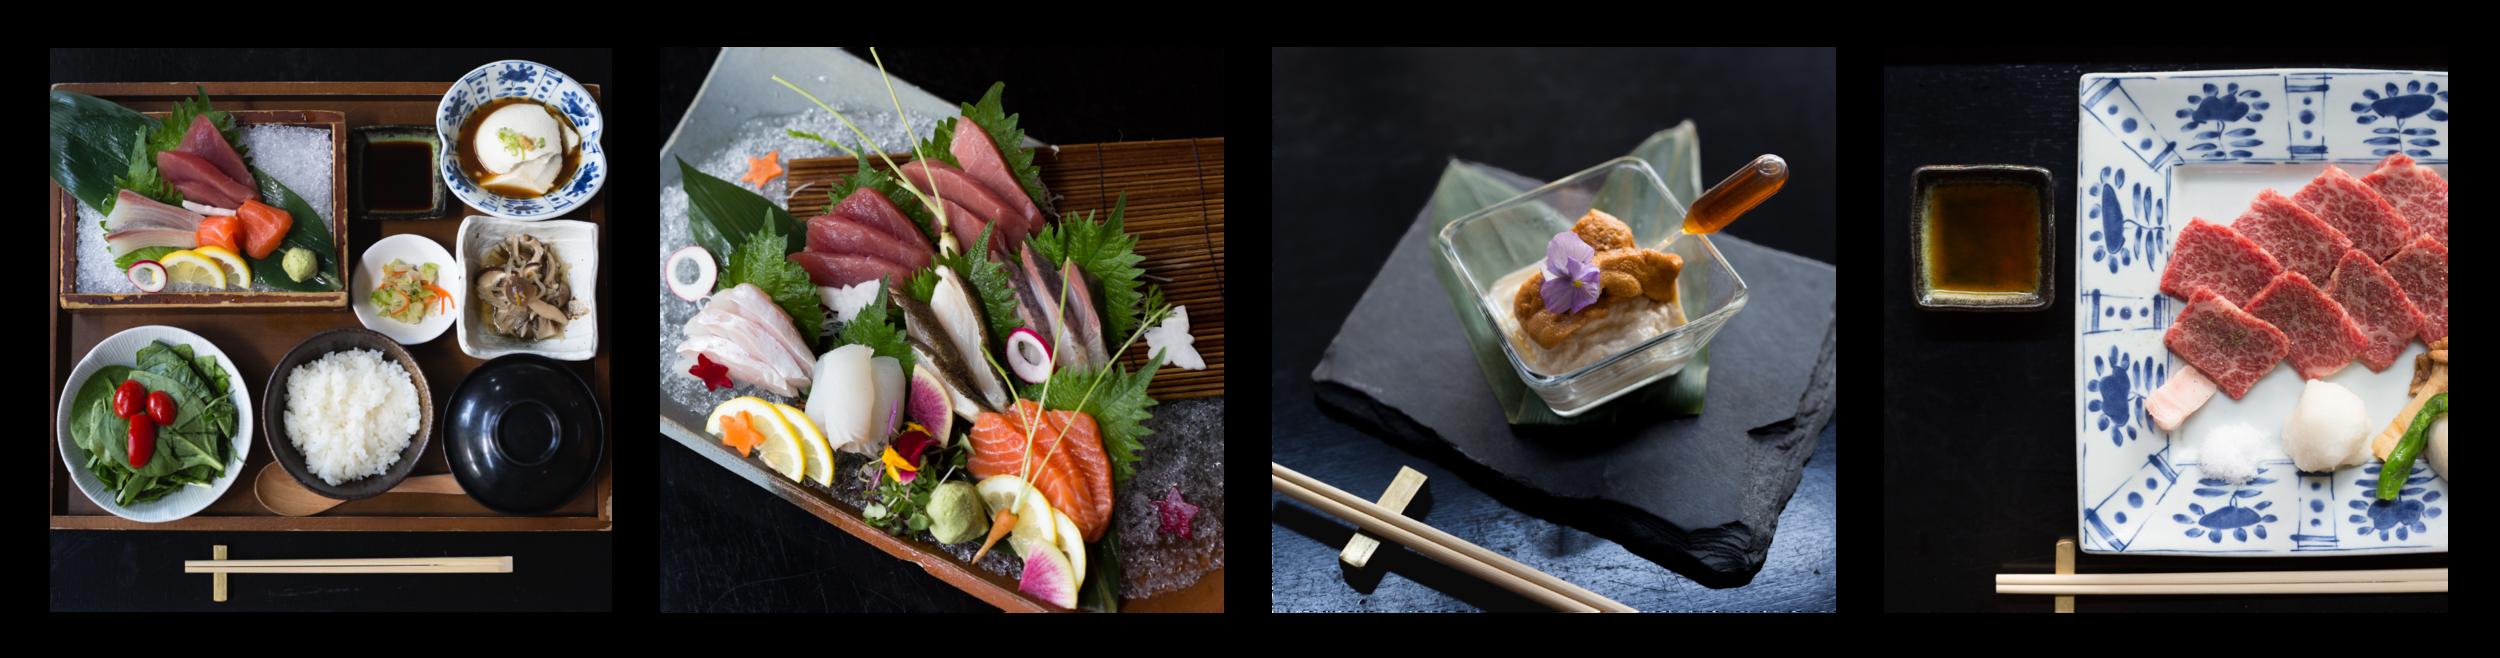 Sashimi Teishoku, Assorted Sashimi, Uni Yuba Sashimi, Stone Grilled Kuroge Washugyu